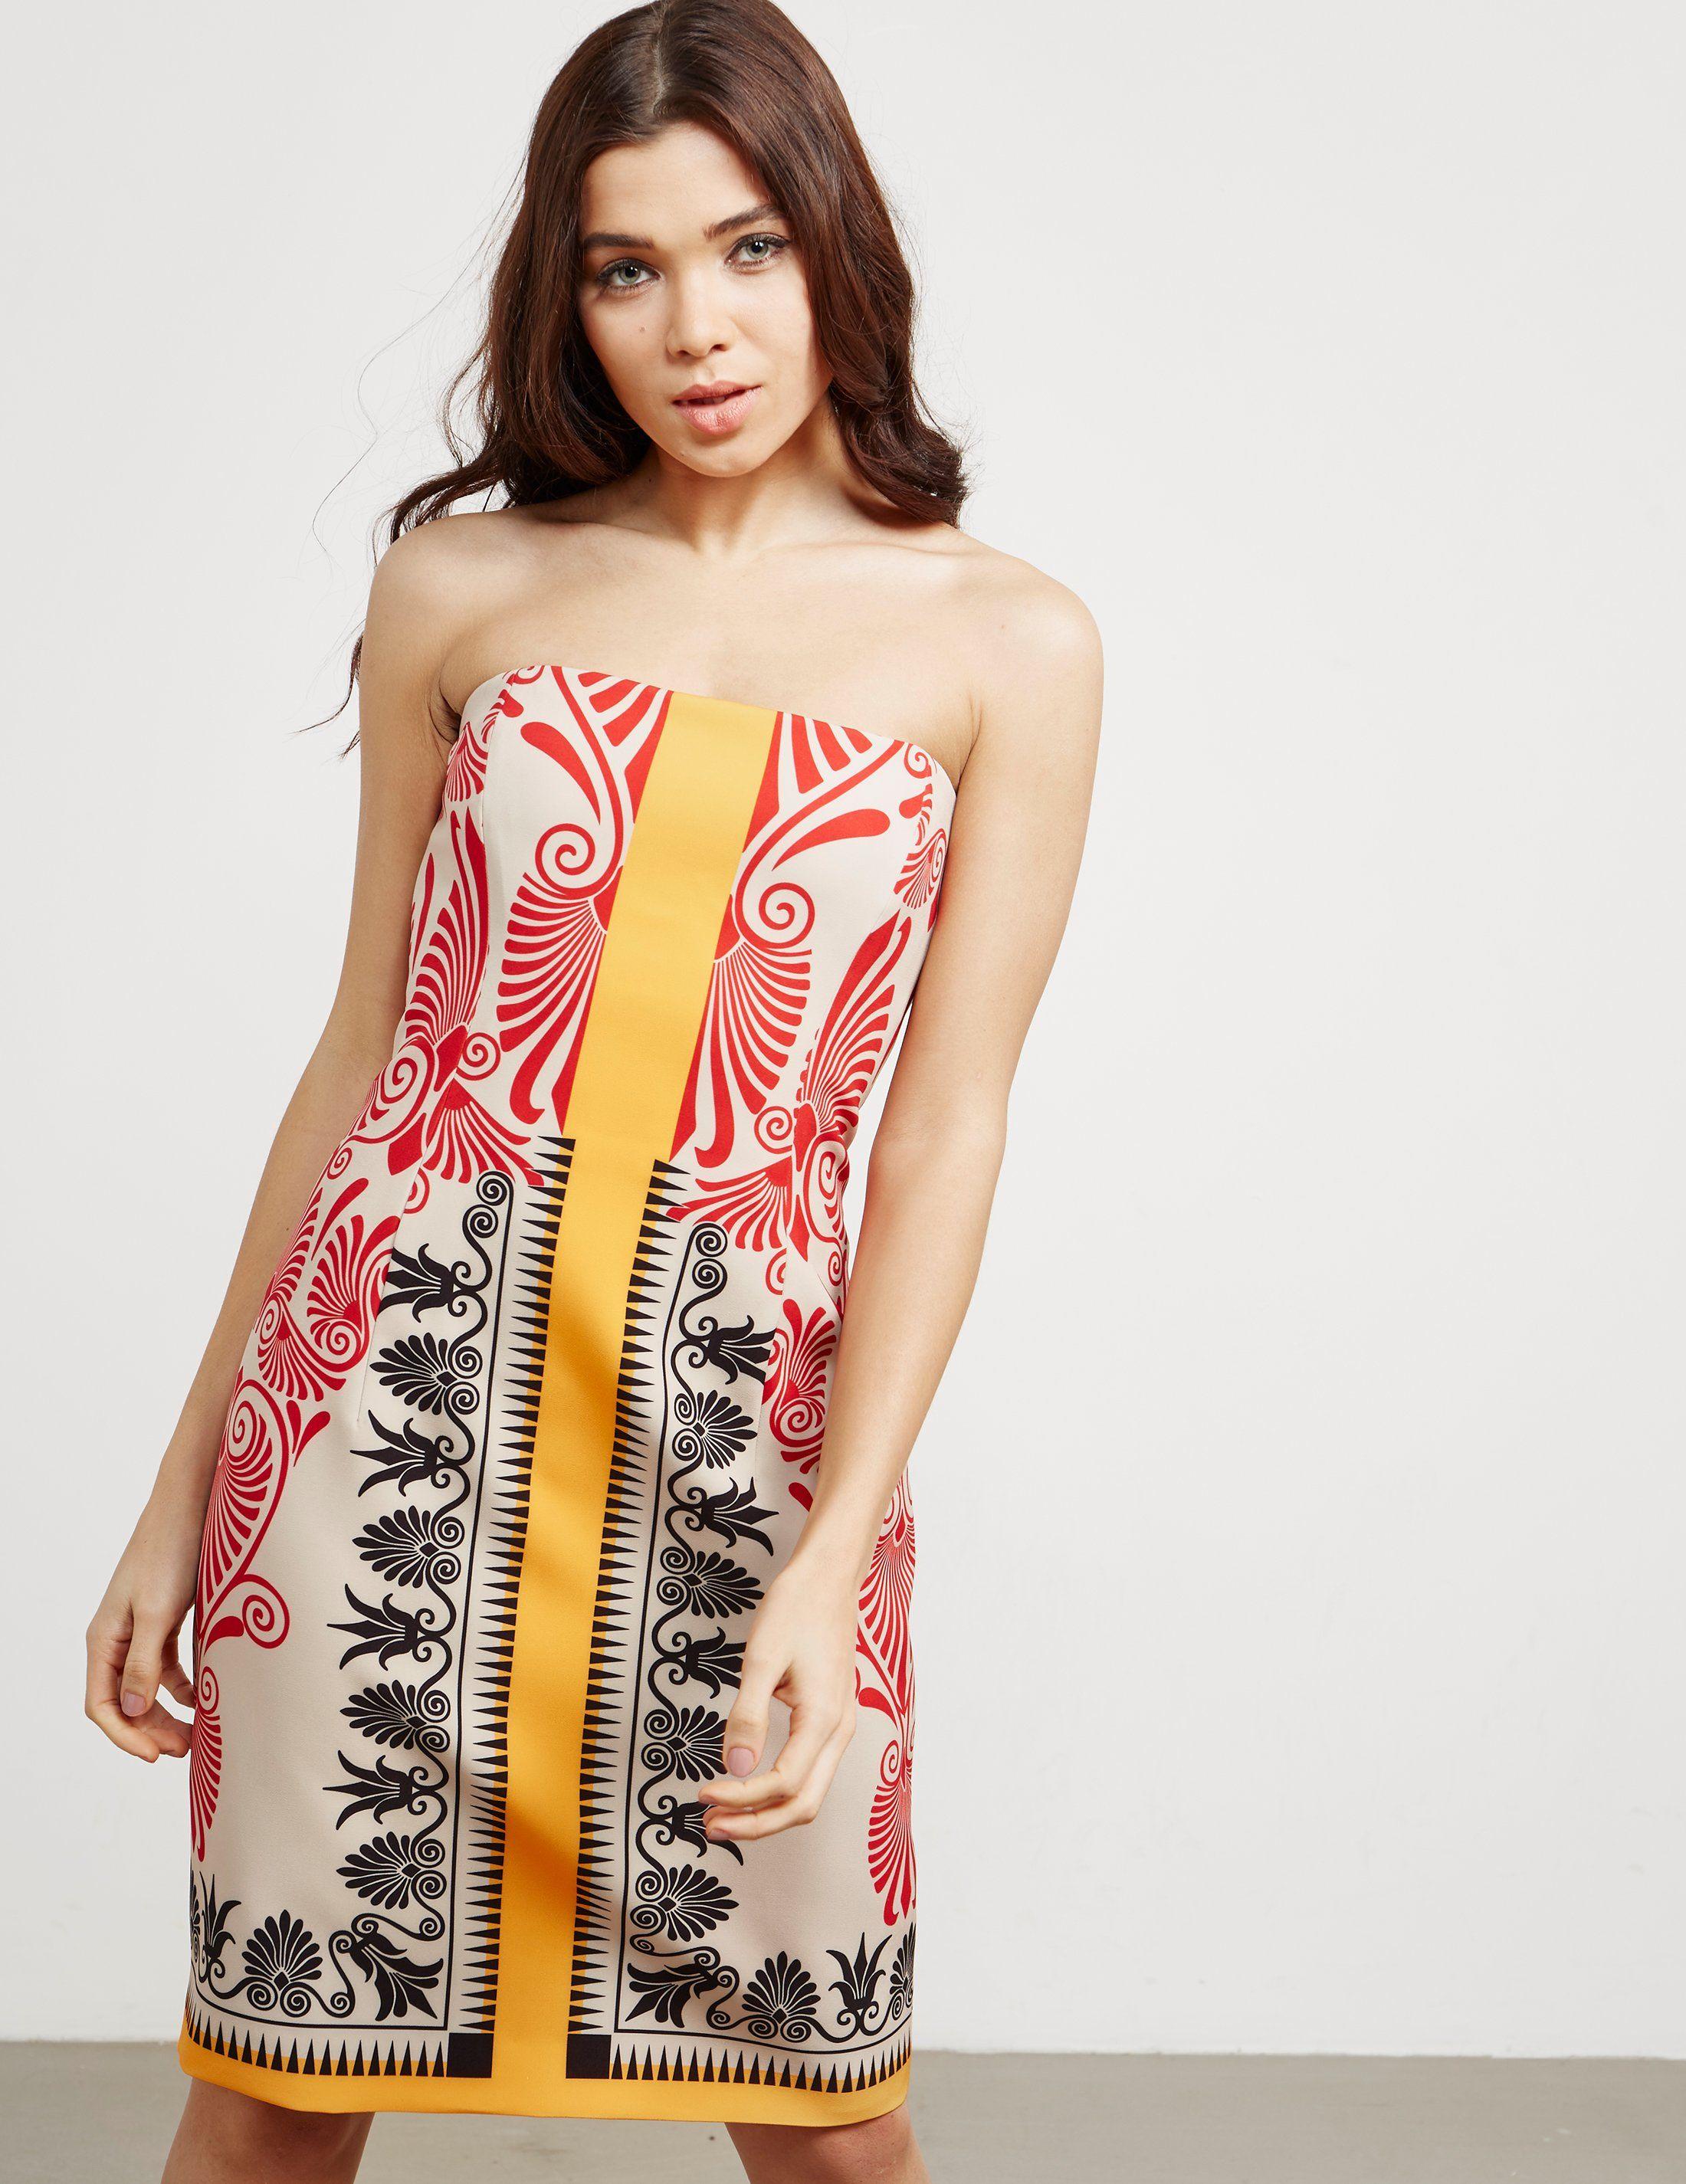 Versace Strapless Print Dress